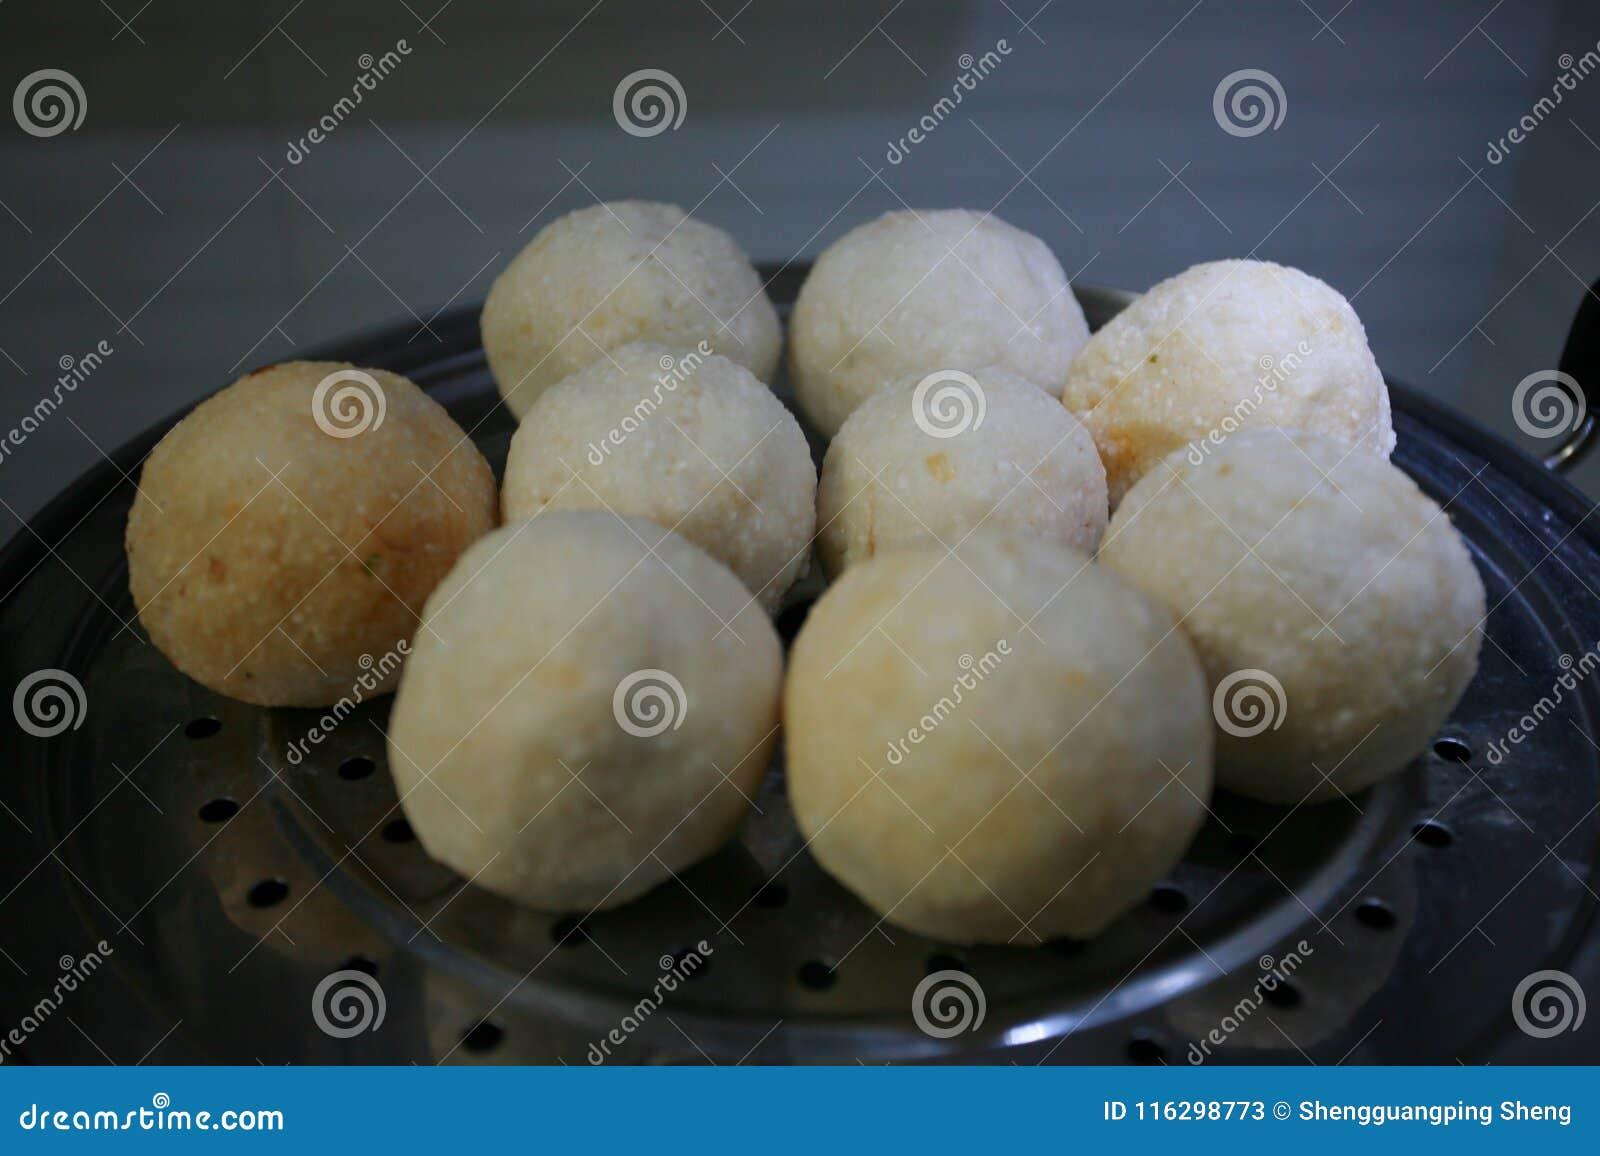 Xiantao flavour snack: rice lump